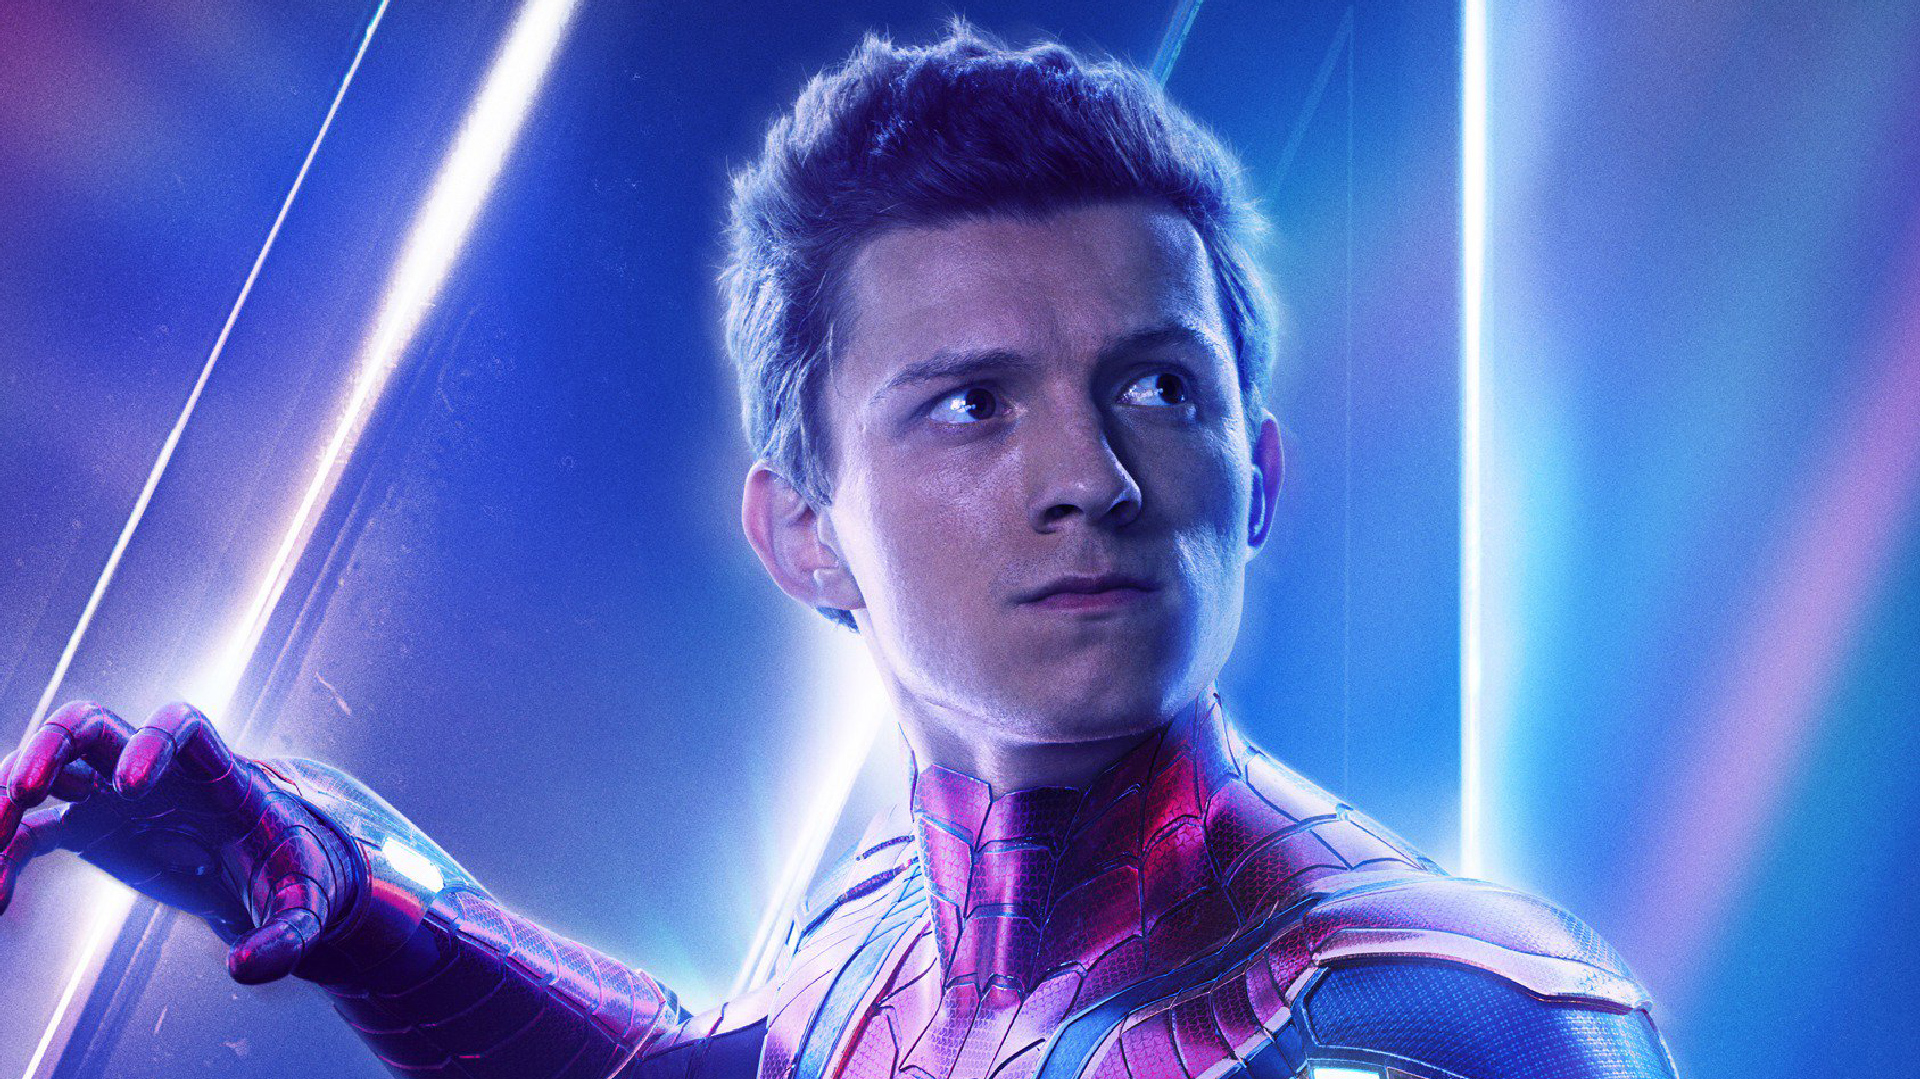 Shuri In Avengers Infinity War New Poster Hd Movies 4k: Spiderman In Avengers Infinity War New Poster, HD Movies